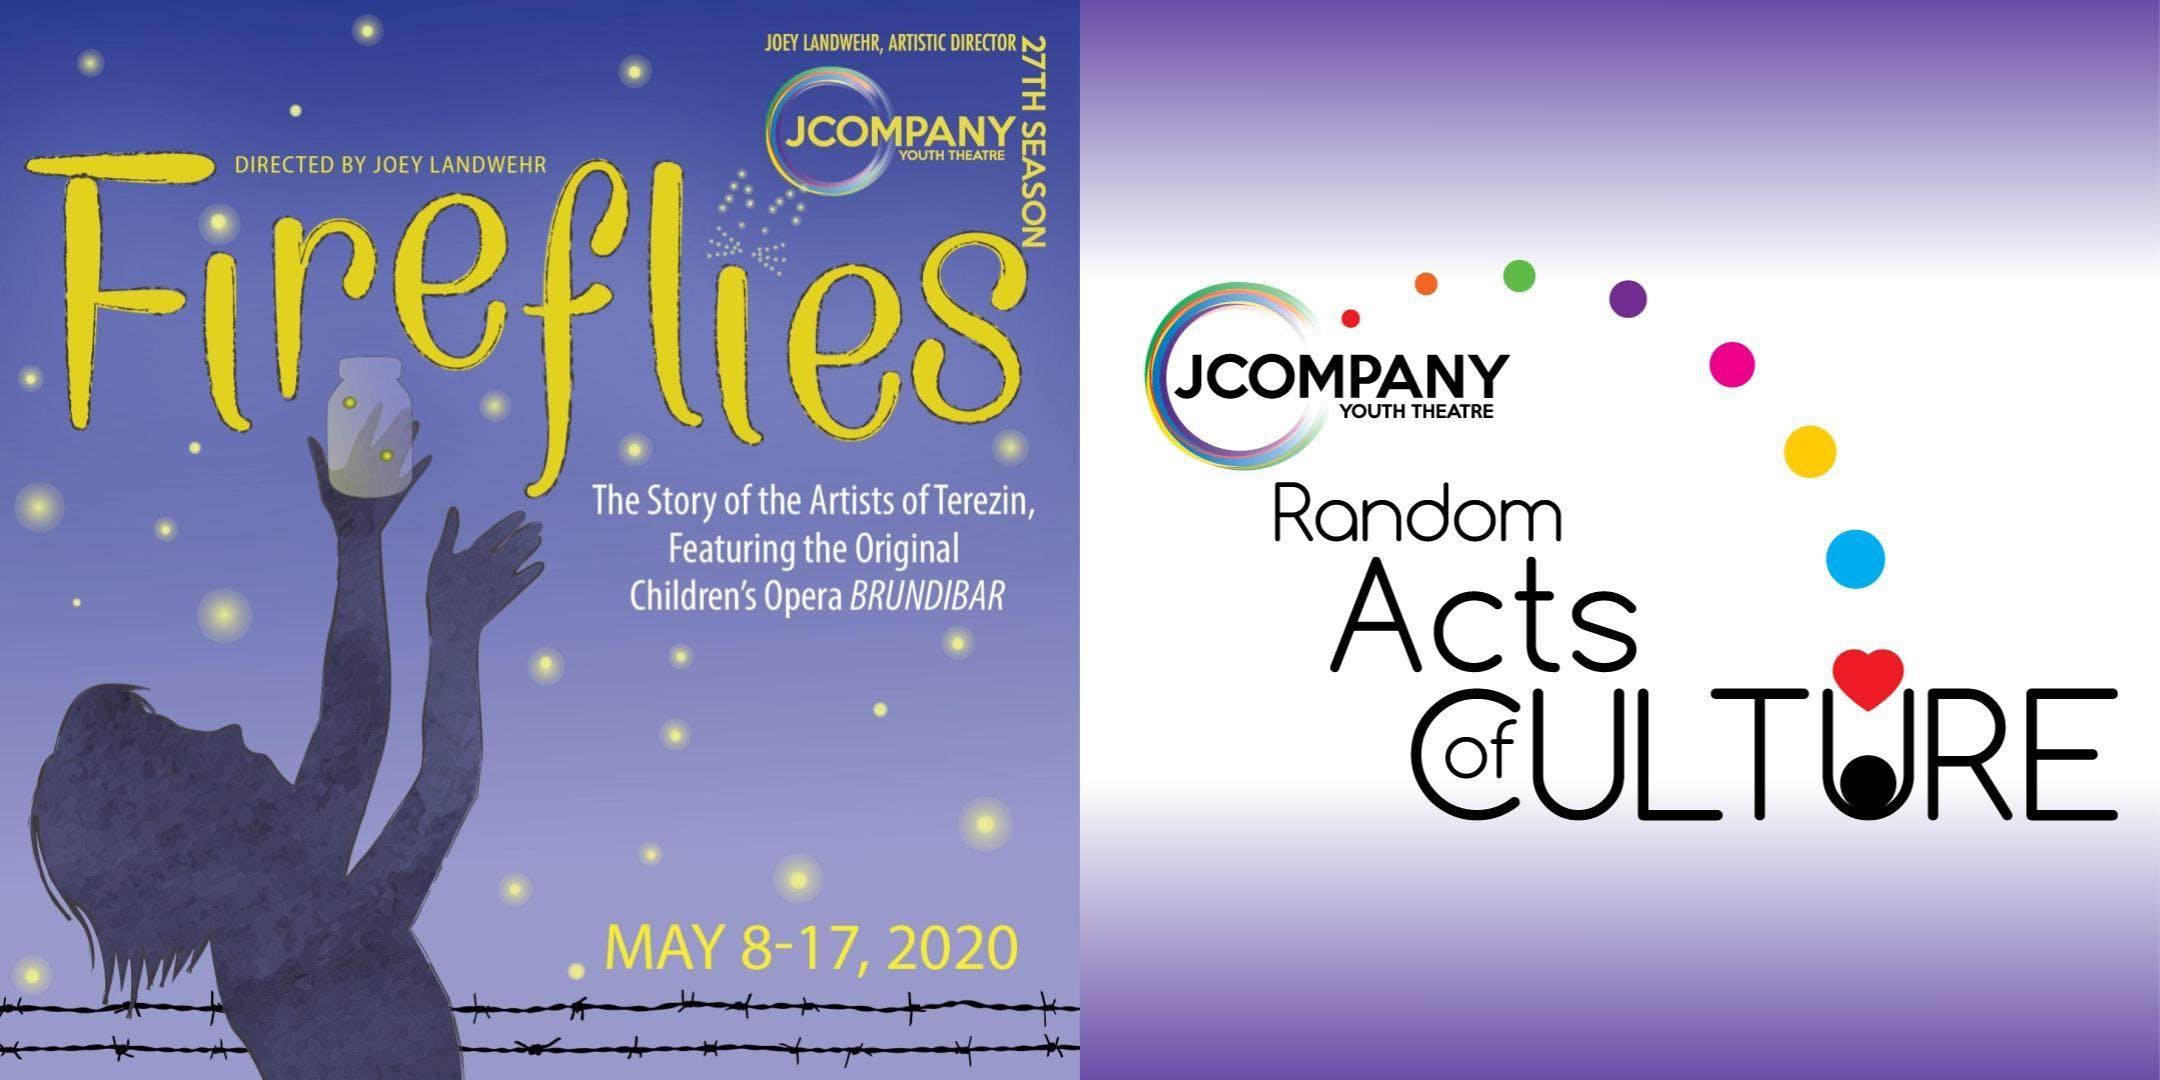 Free Tickets to Fireflies & The Childrens Opera Brundibar